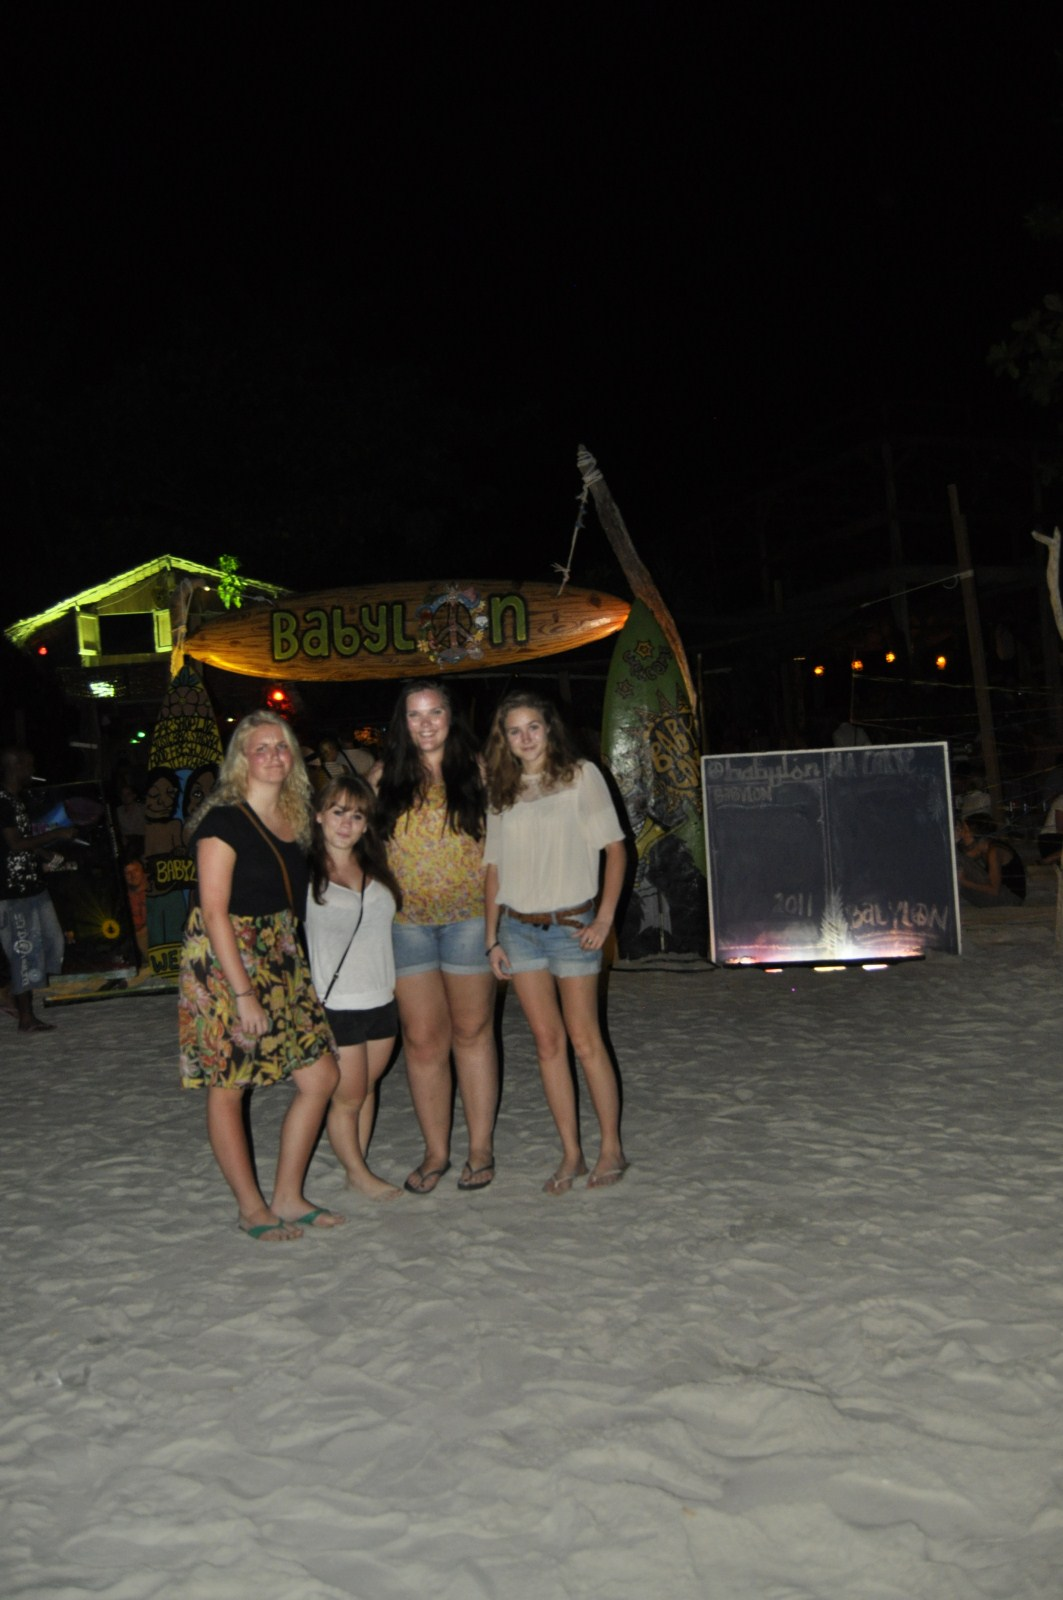 nummer till horor tjejer på stranden